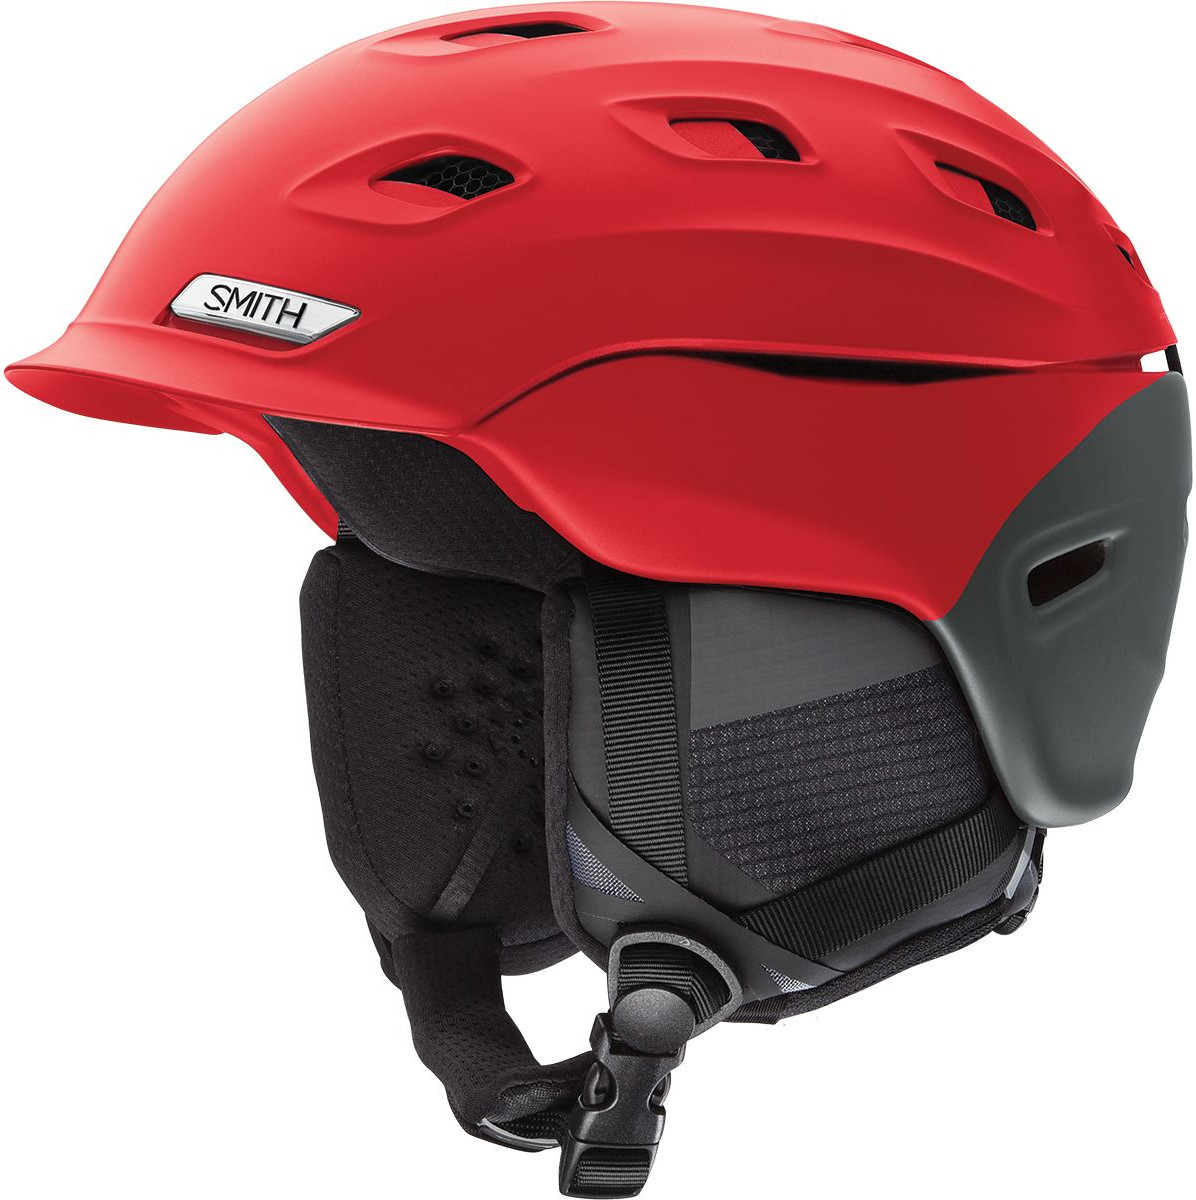 Smith Optics Vantage Ski Snow Helmet (Matte Fire Split Large) by Smith Optics